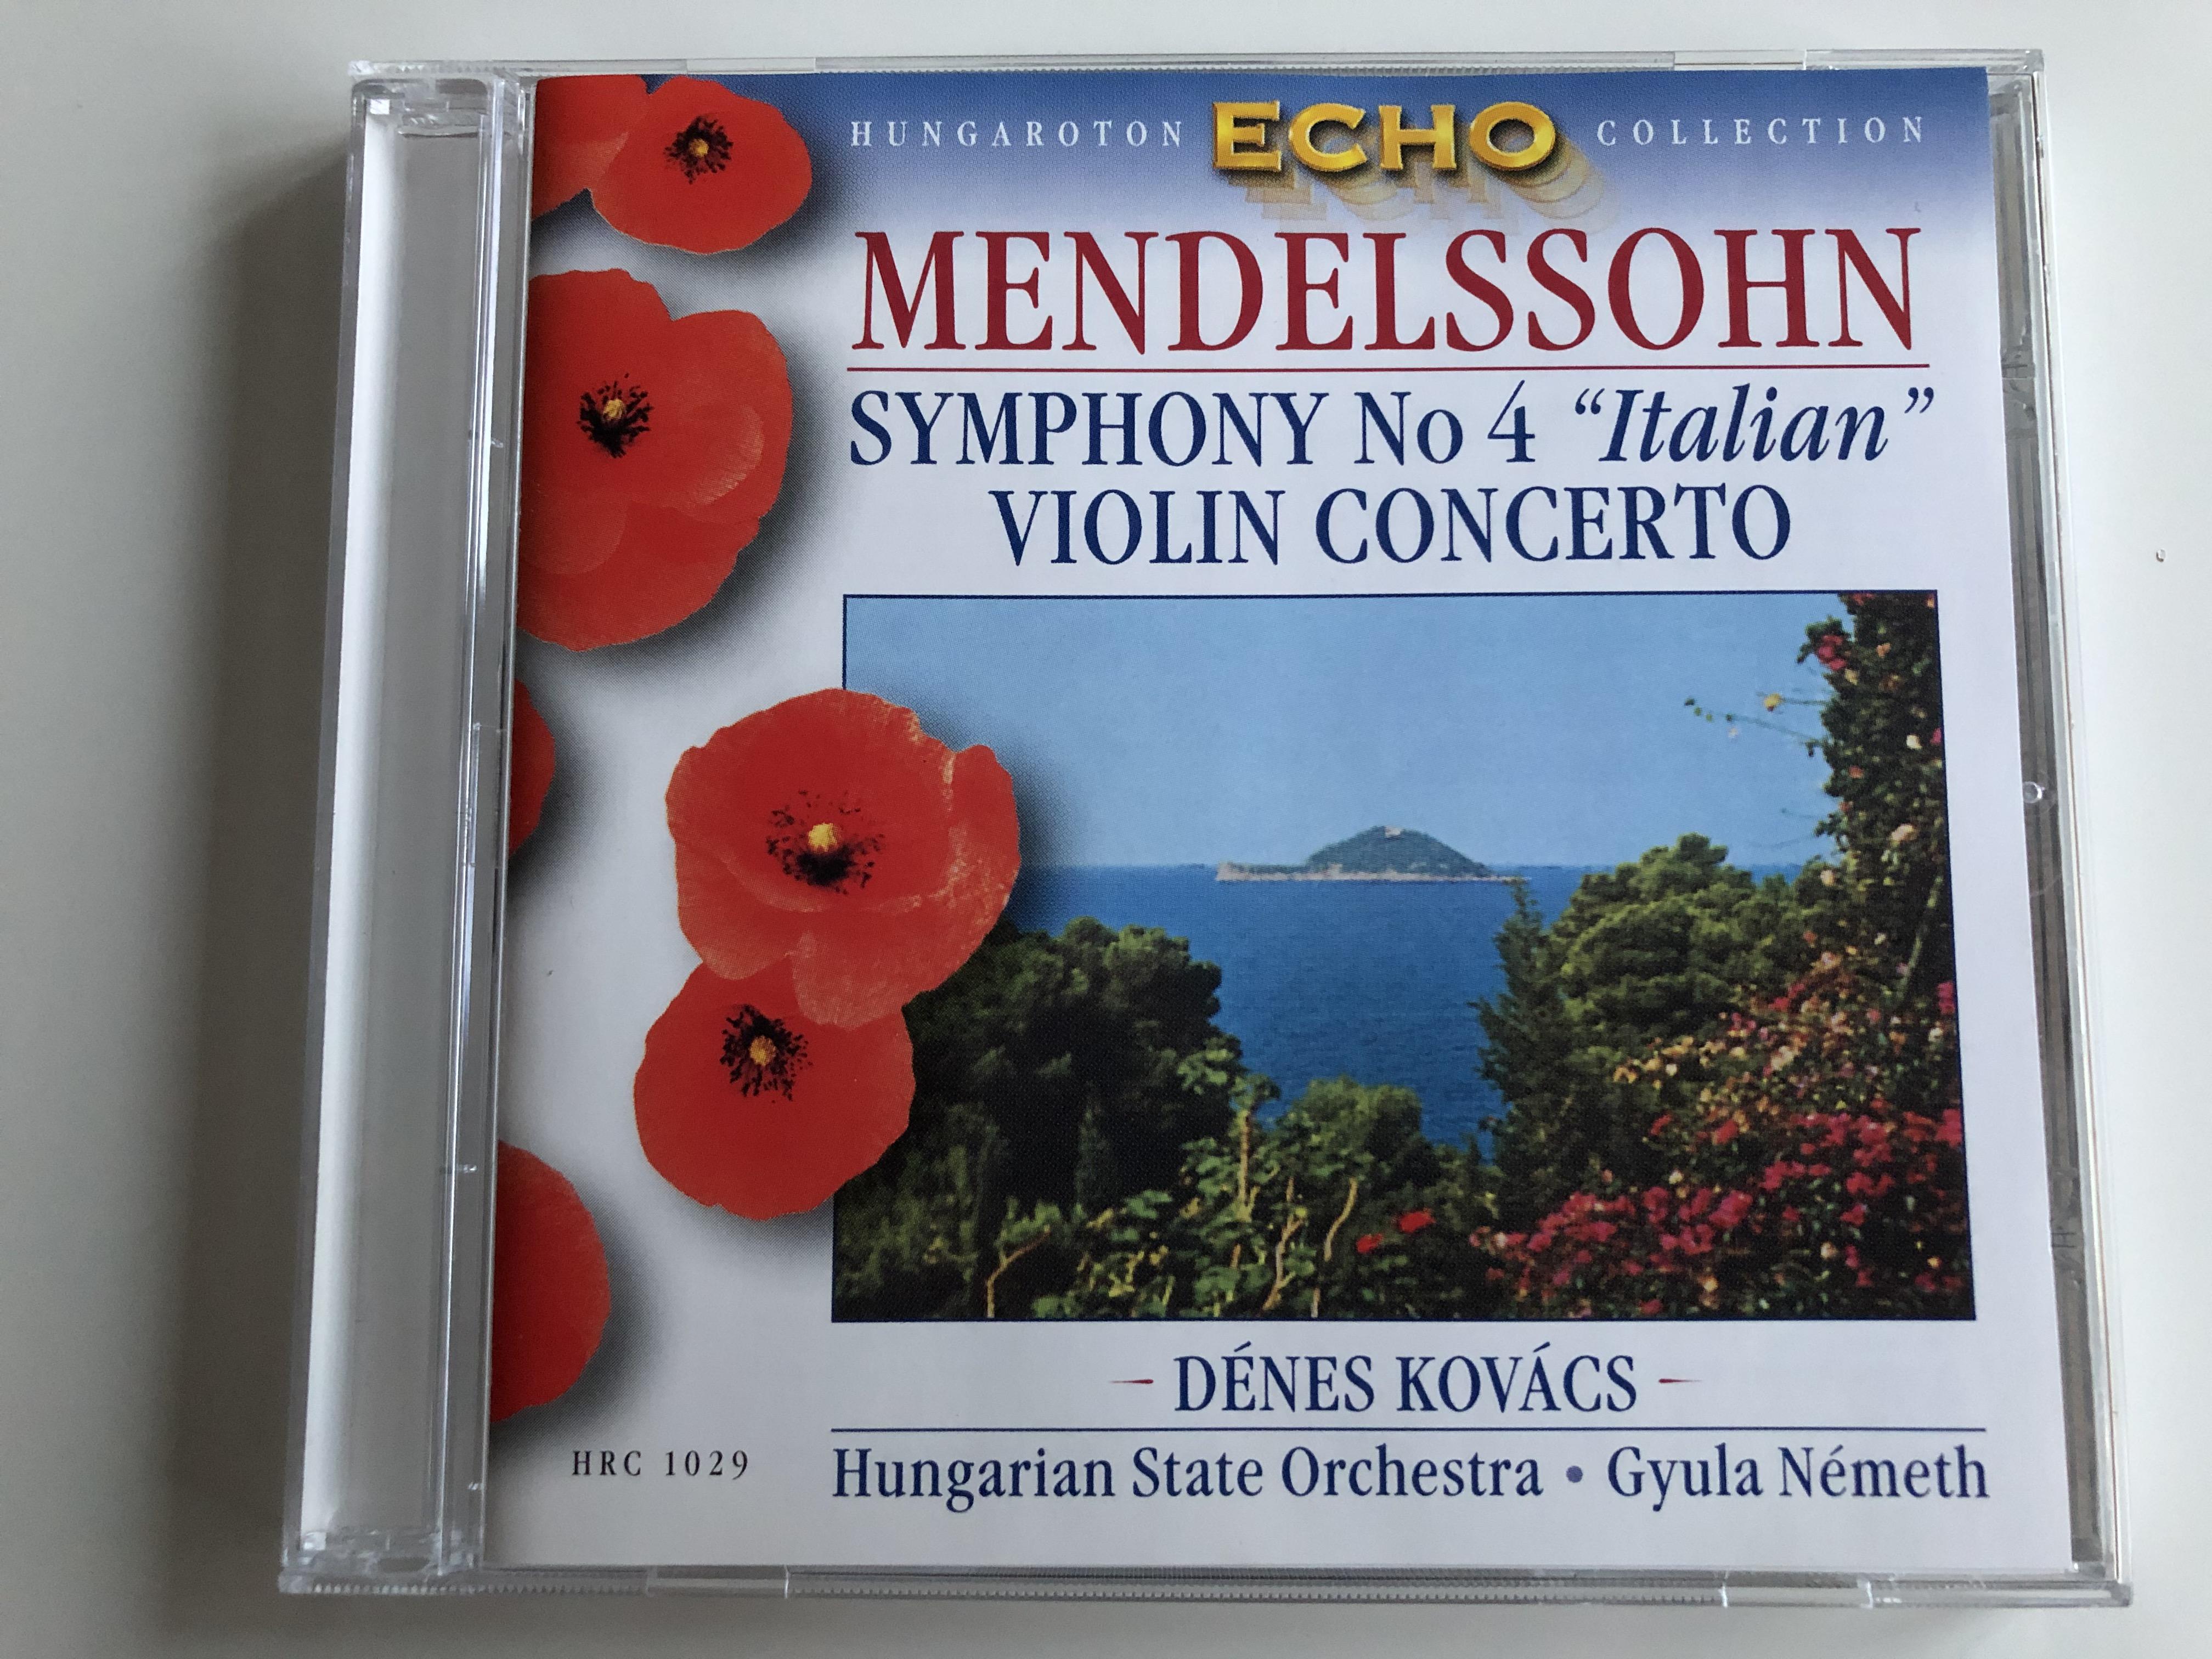 mendelssohn-symphony-no.4-italian-violin-concerto-d-nes-kov-cs-hungarian-state-orchestra-gyula-n-meth-hungaroton-classic-audio-cd-1964-stereo-hrc-1029-1-.jpg